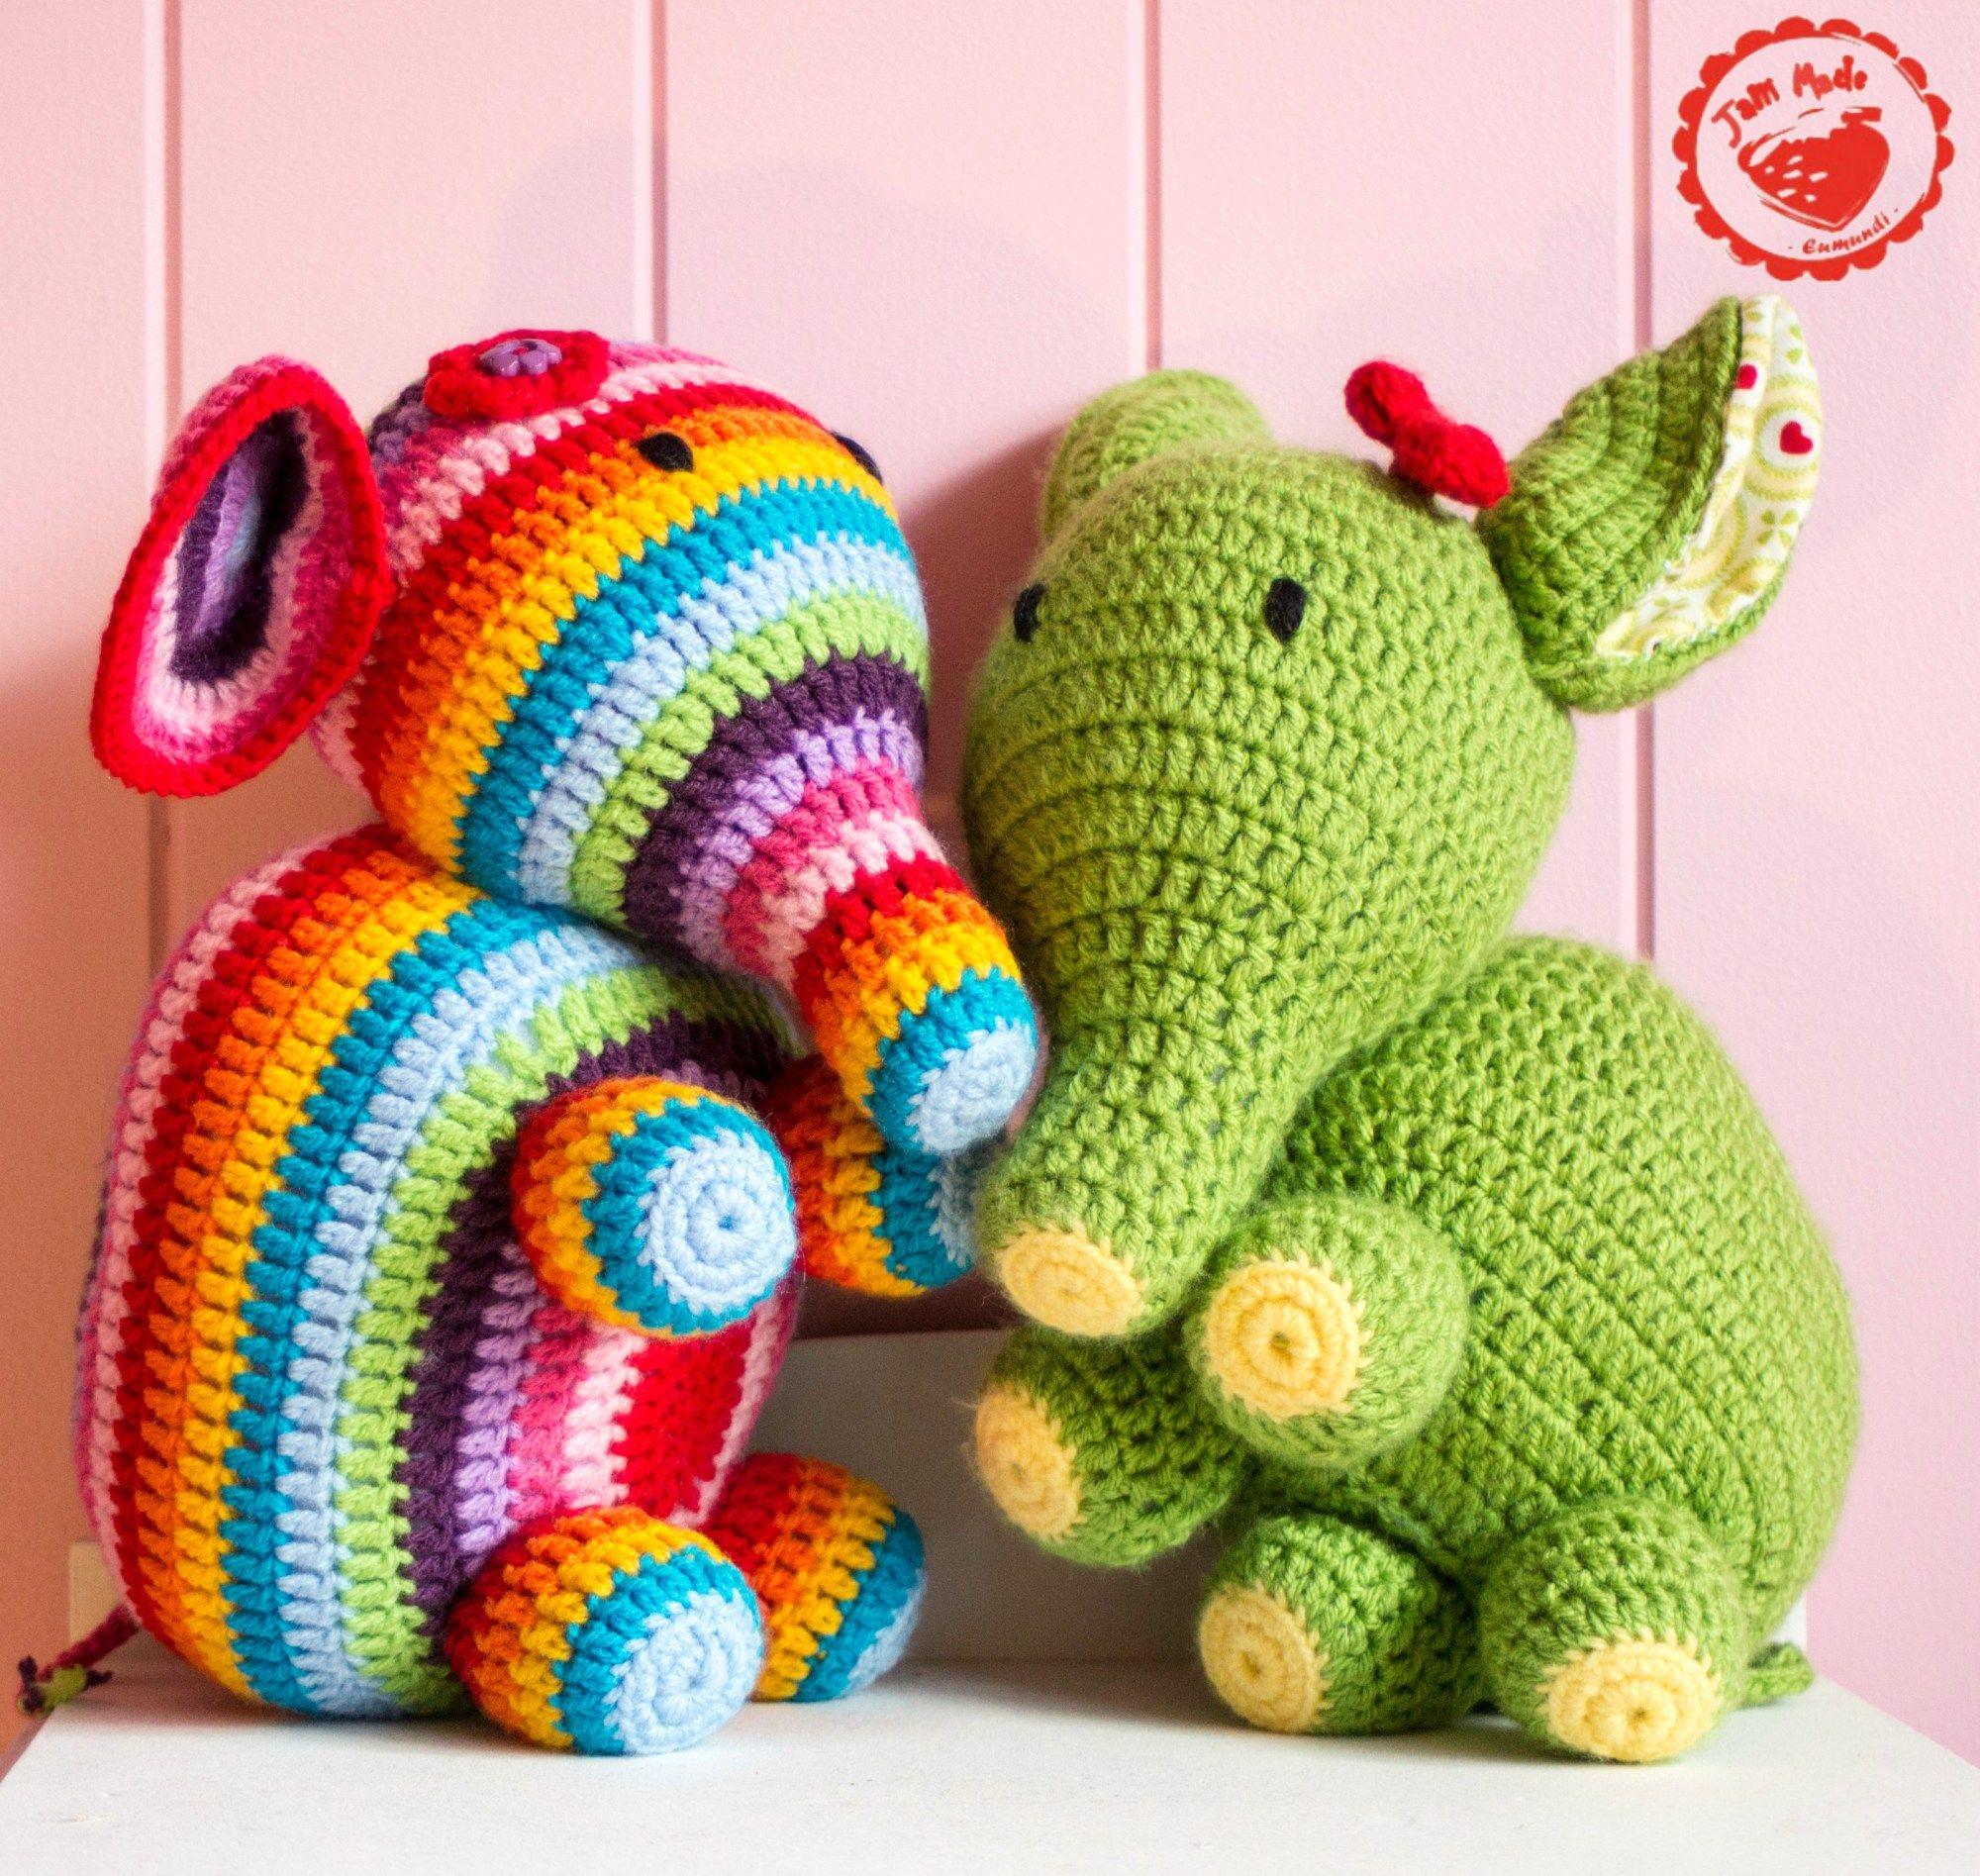 18 Free Crochet Patterns for Amazing Handmade Toys | Amigurumi ...